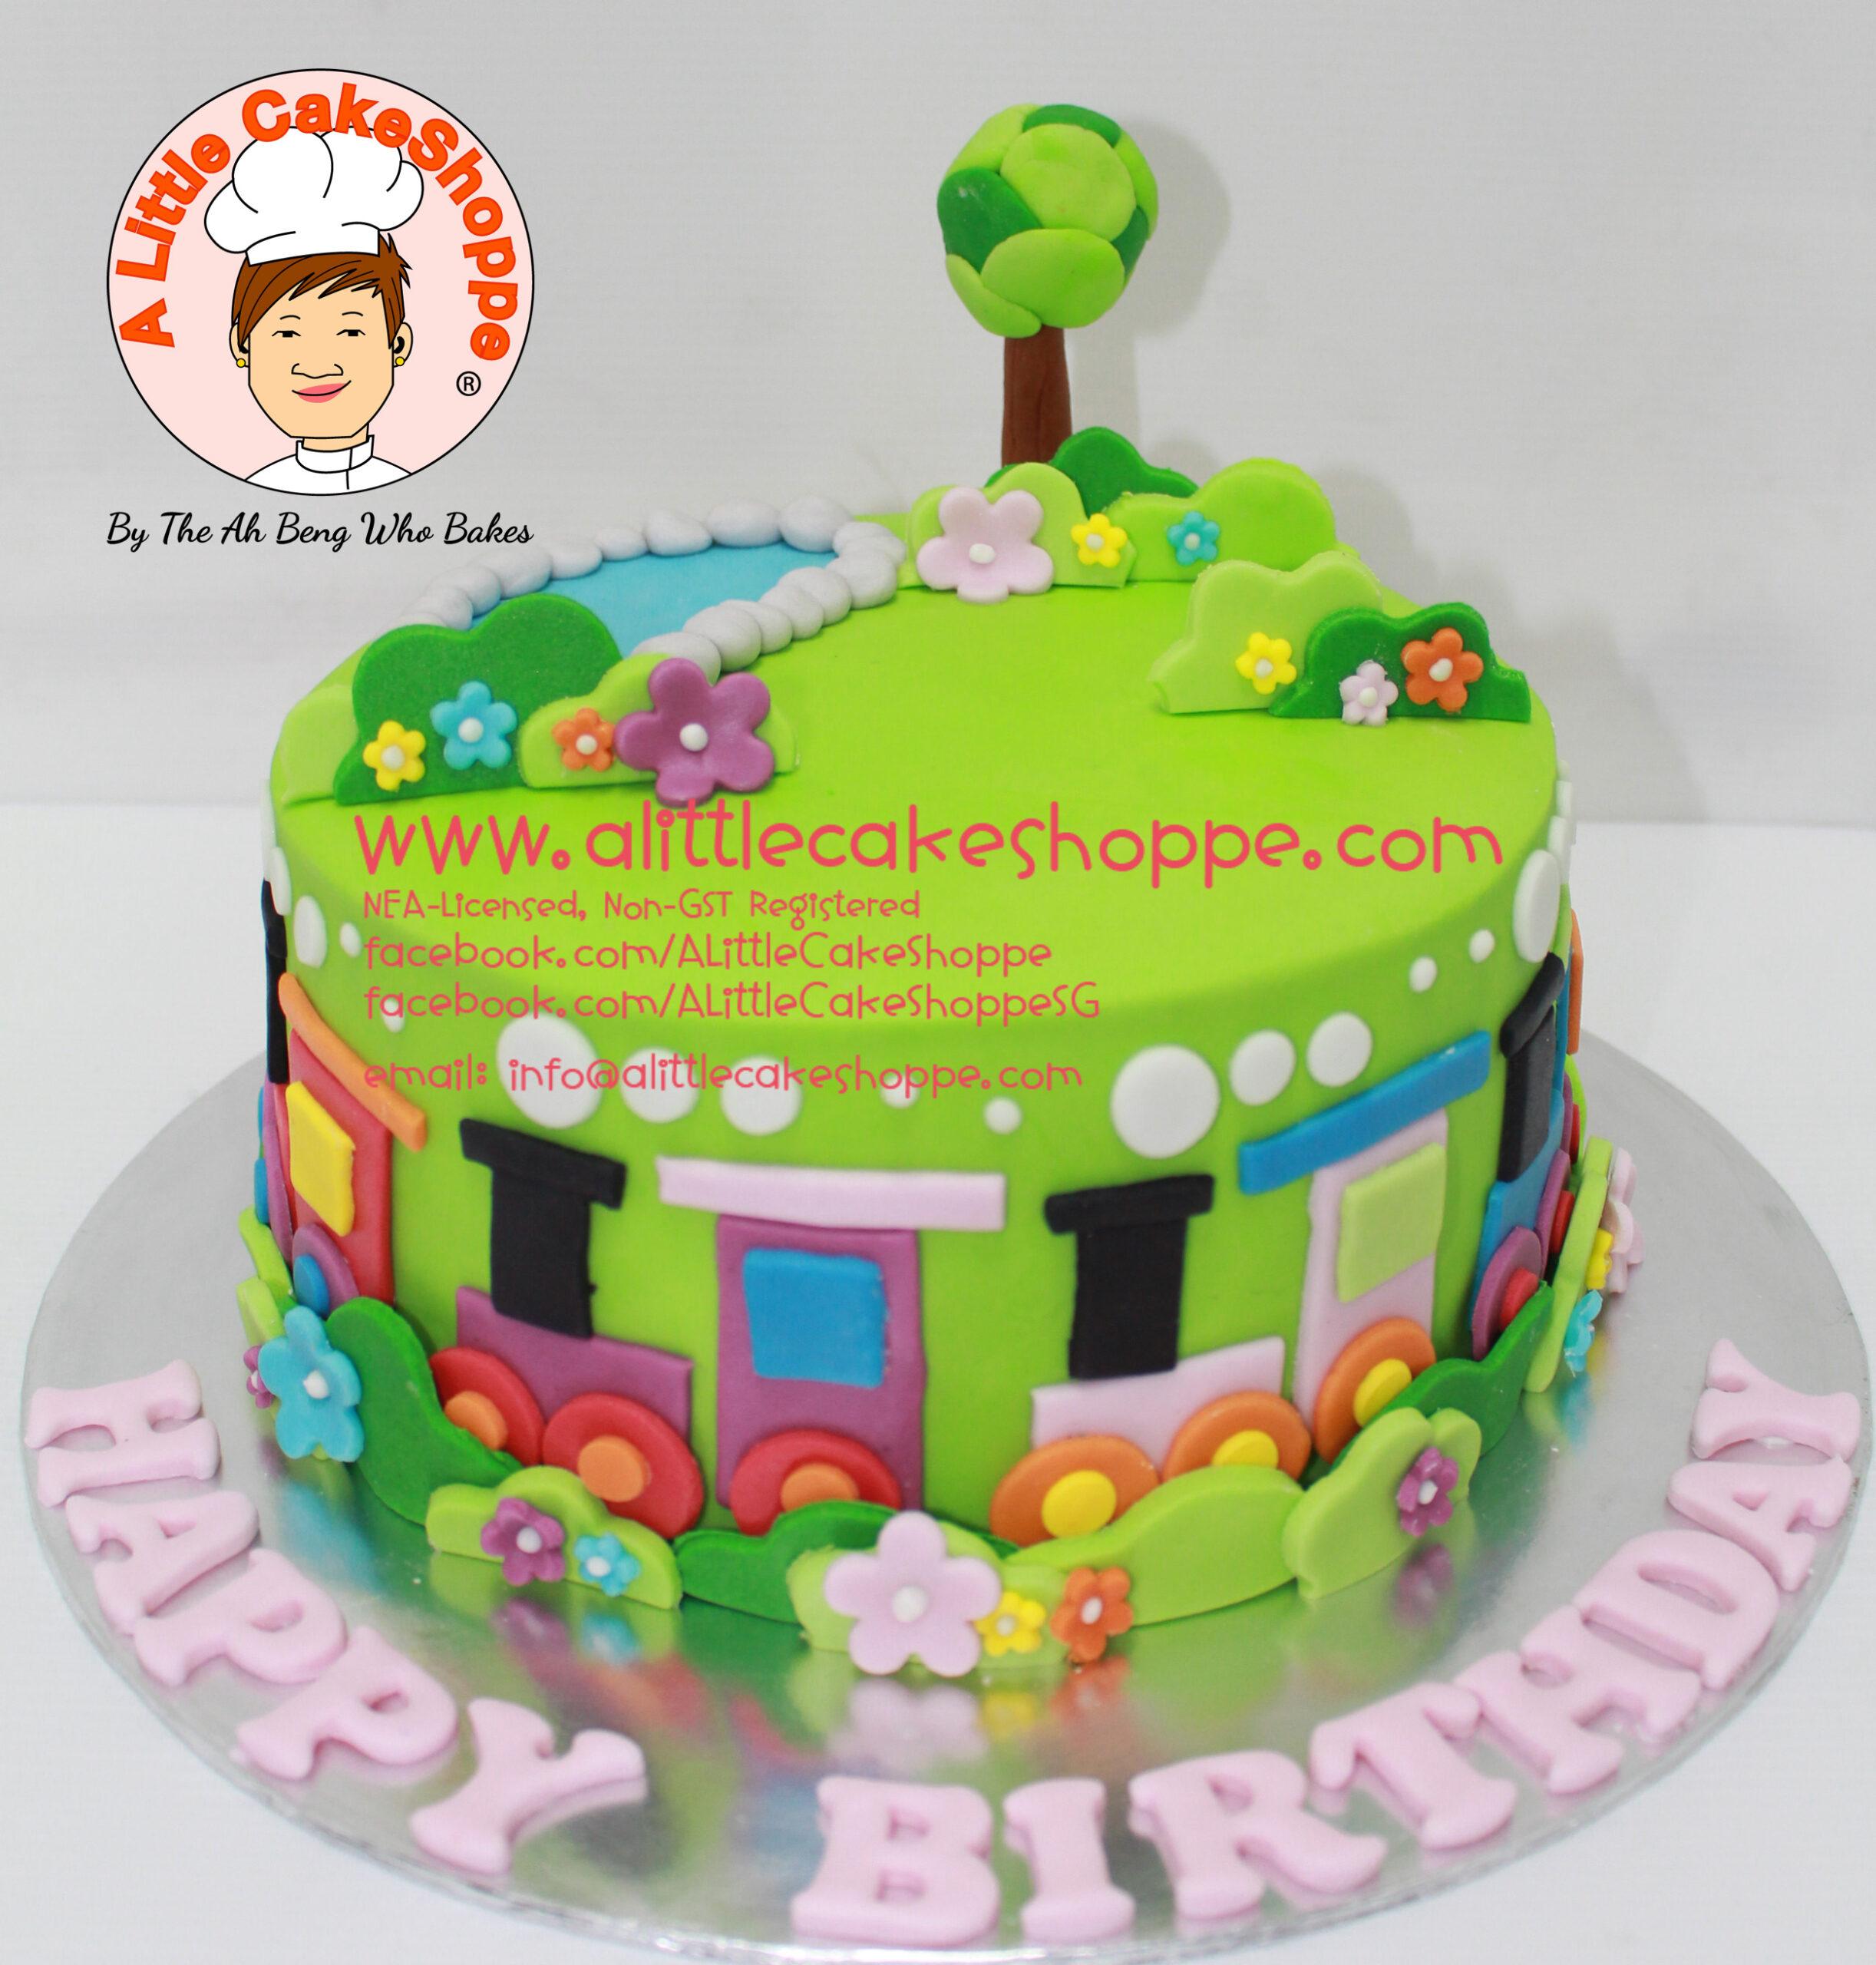 Best Customised Cake Shop Singapore custom cake 2D 3D birthday cake cupcakes desserts wedding corporate events anniversary 1st birthday 21st birthday fondant fresh cream buttercream cakes alittlecakeshoppe a little cake shoppe compliments review singapore bakers SG cake shop cakeshop ah beng who bakes garden